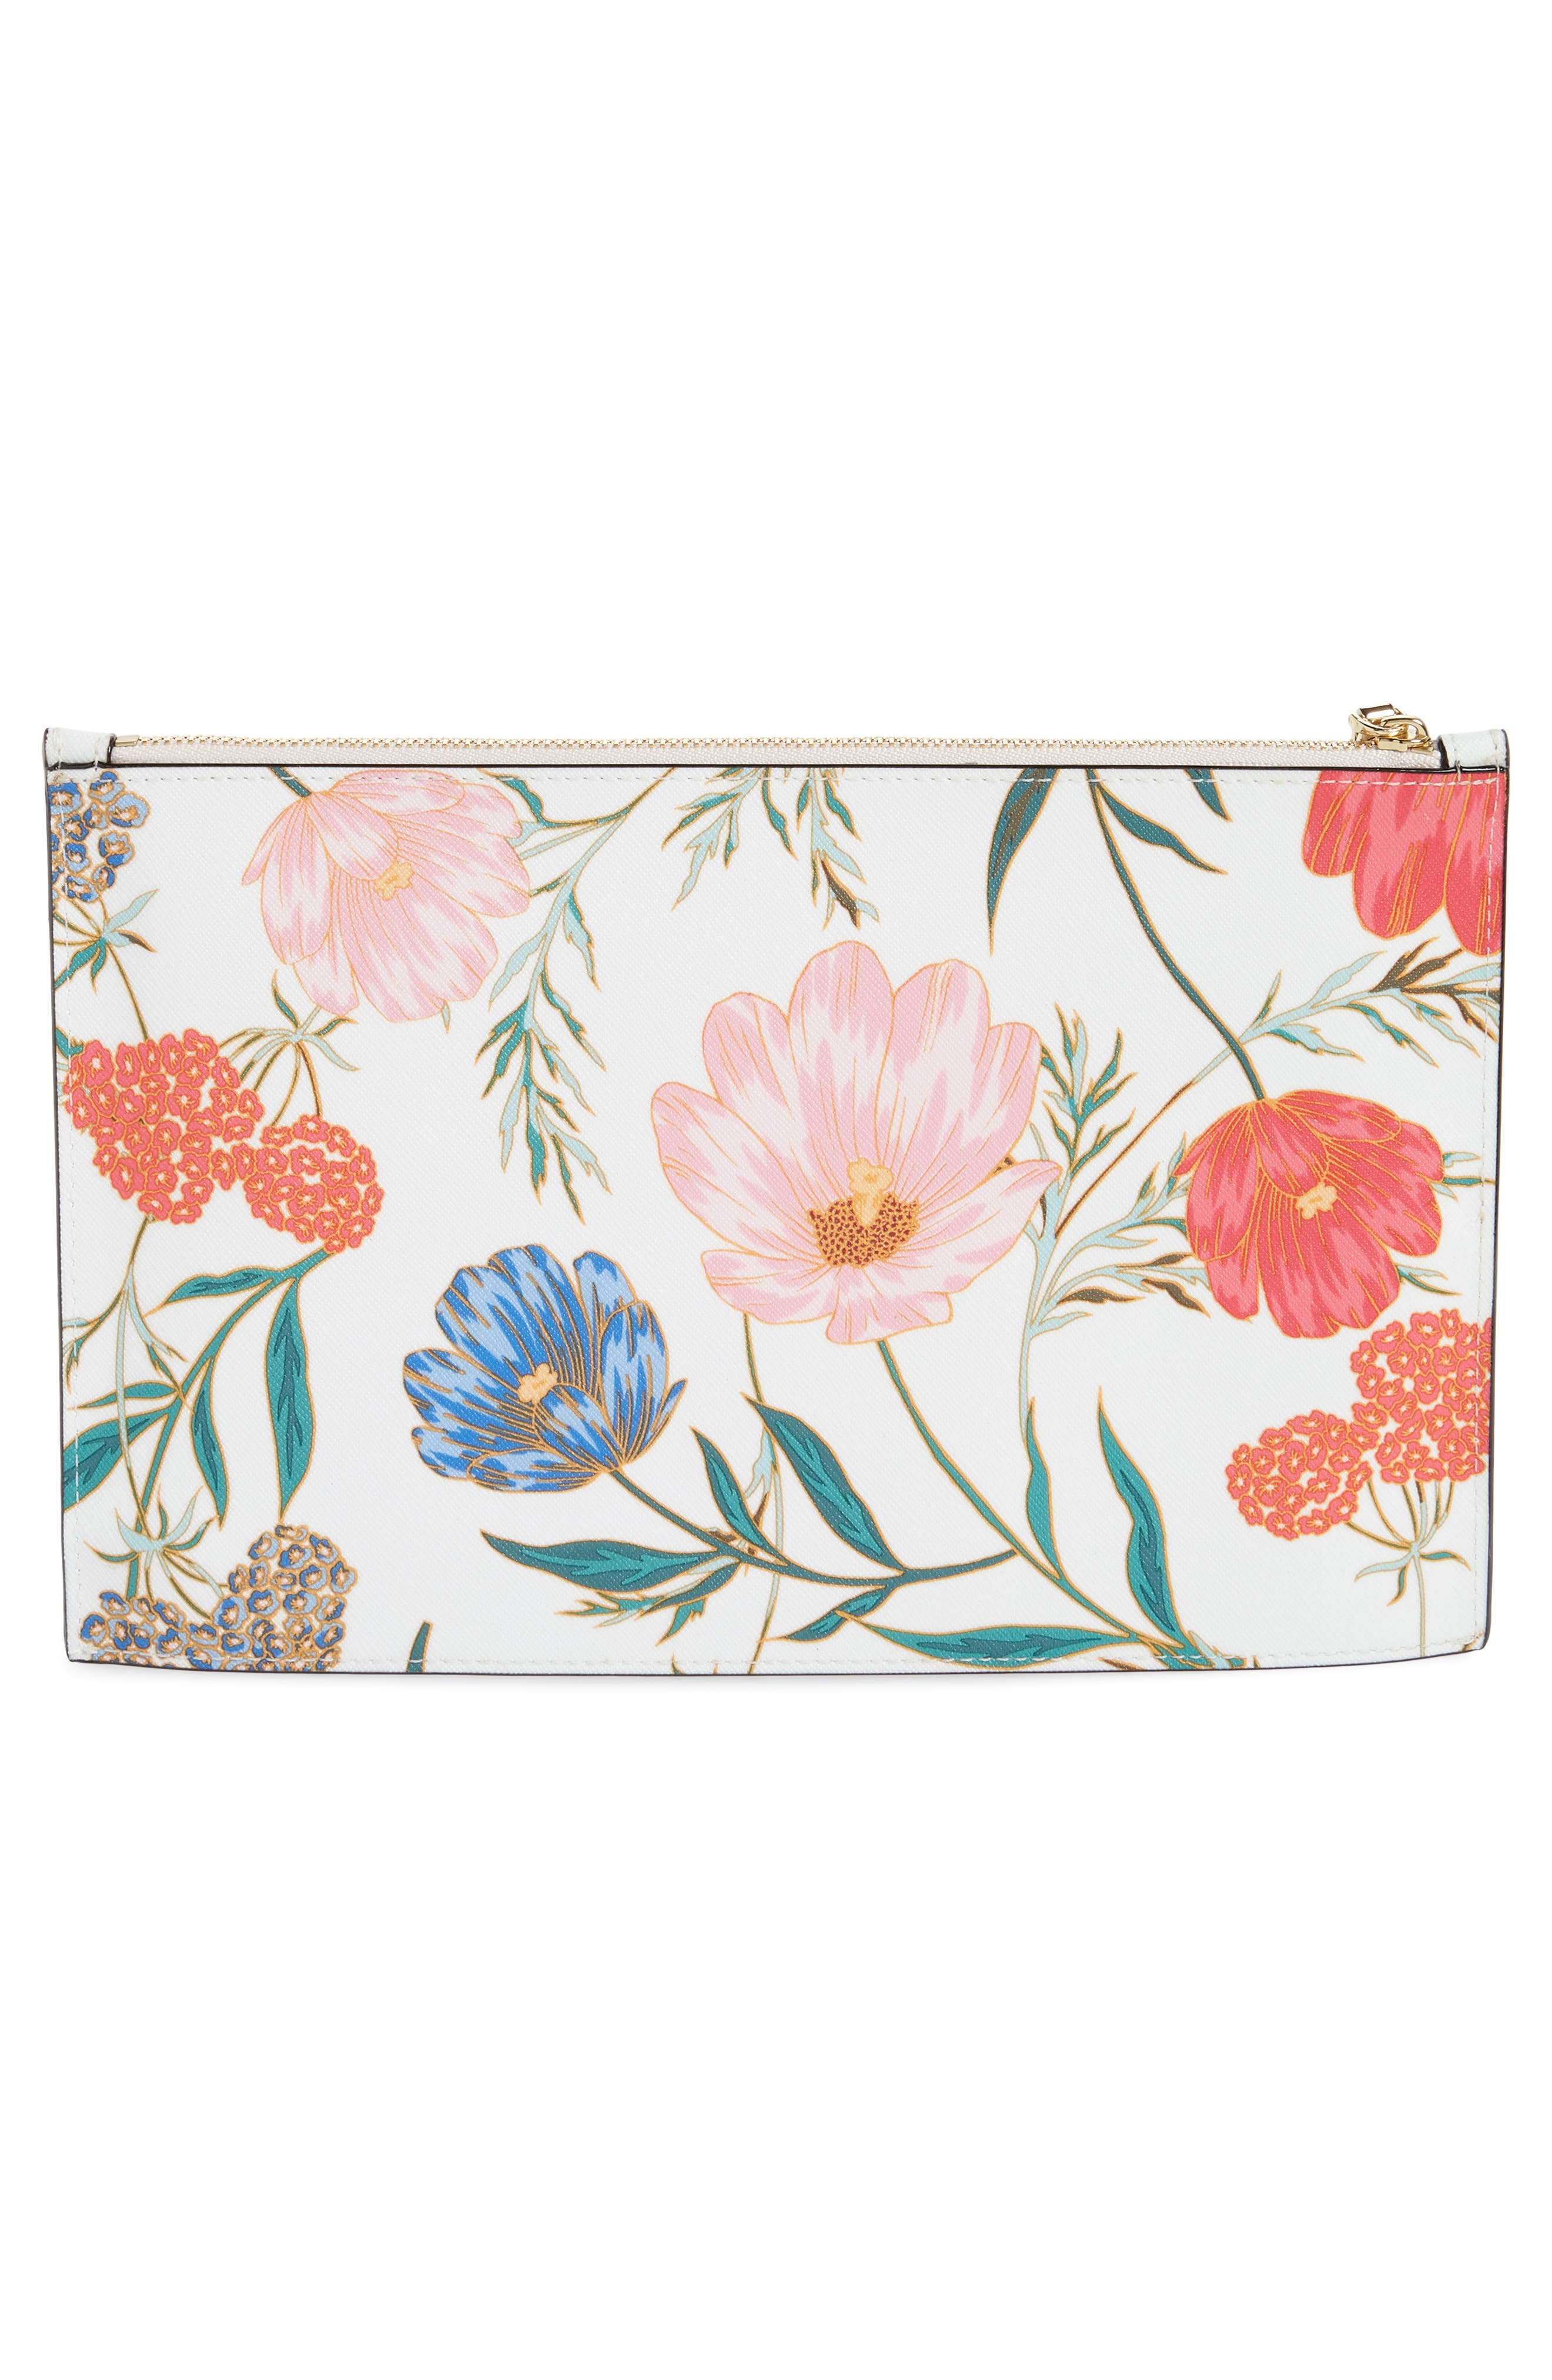 cameron street – blossom lilia leather clutch,                             Alternate thumbnail 3, color,